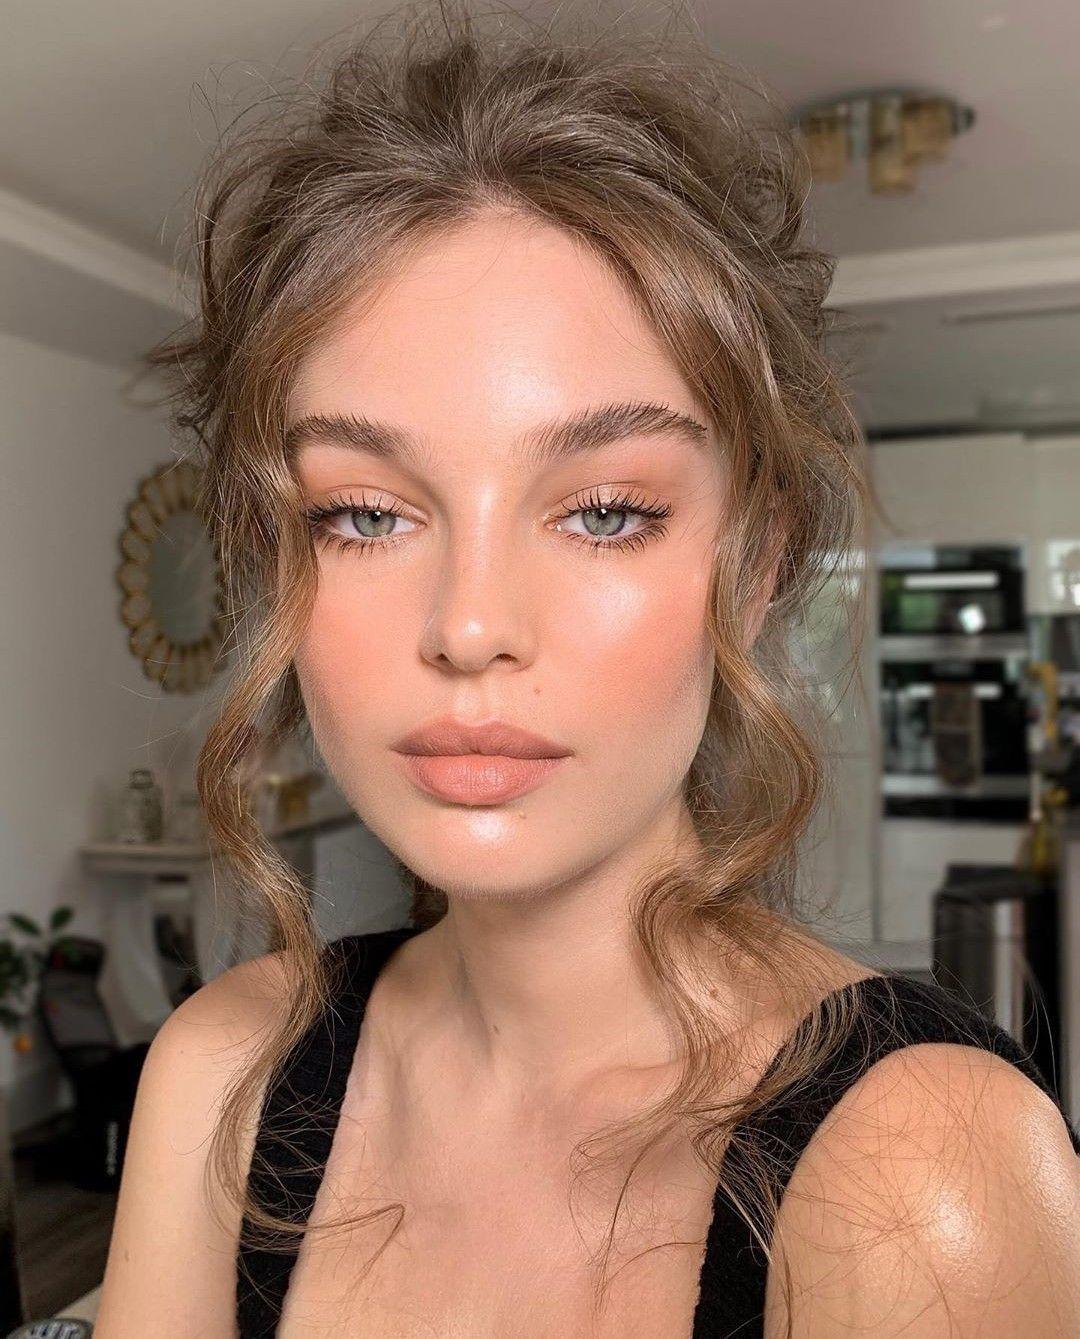 Ana Paula Leme pin de ana paula leme em favorito em 2019   maquiagem beleza